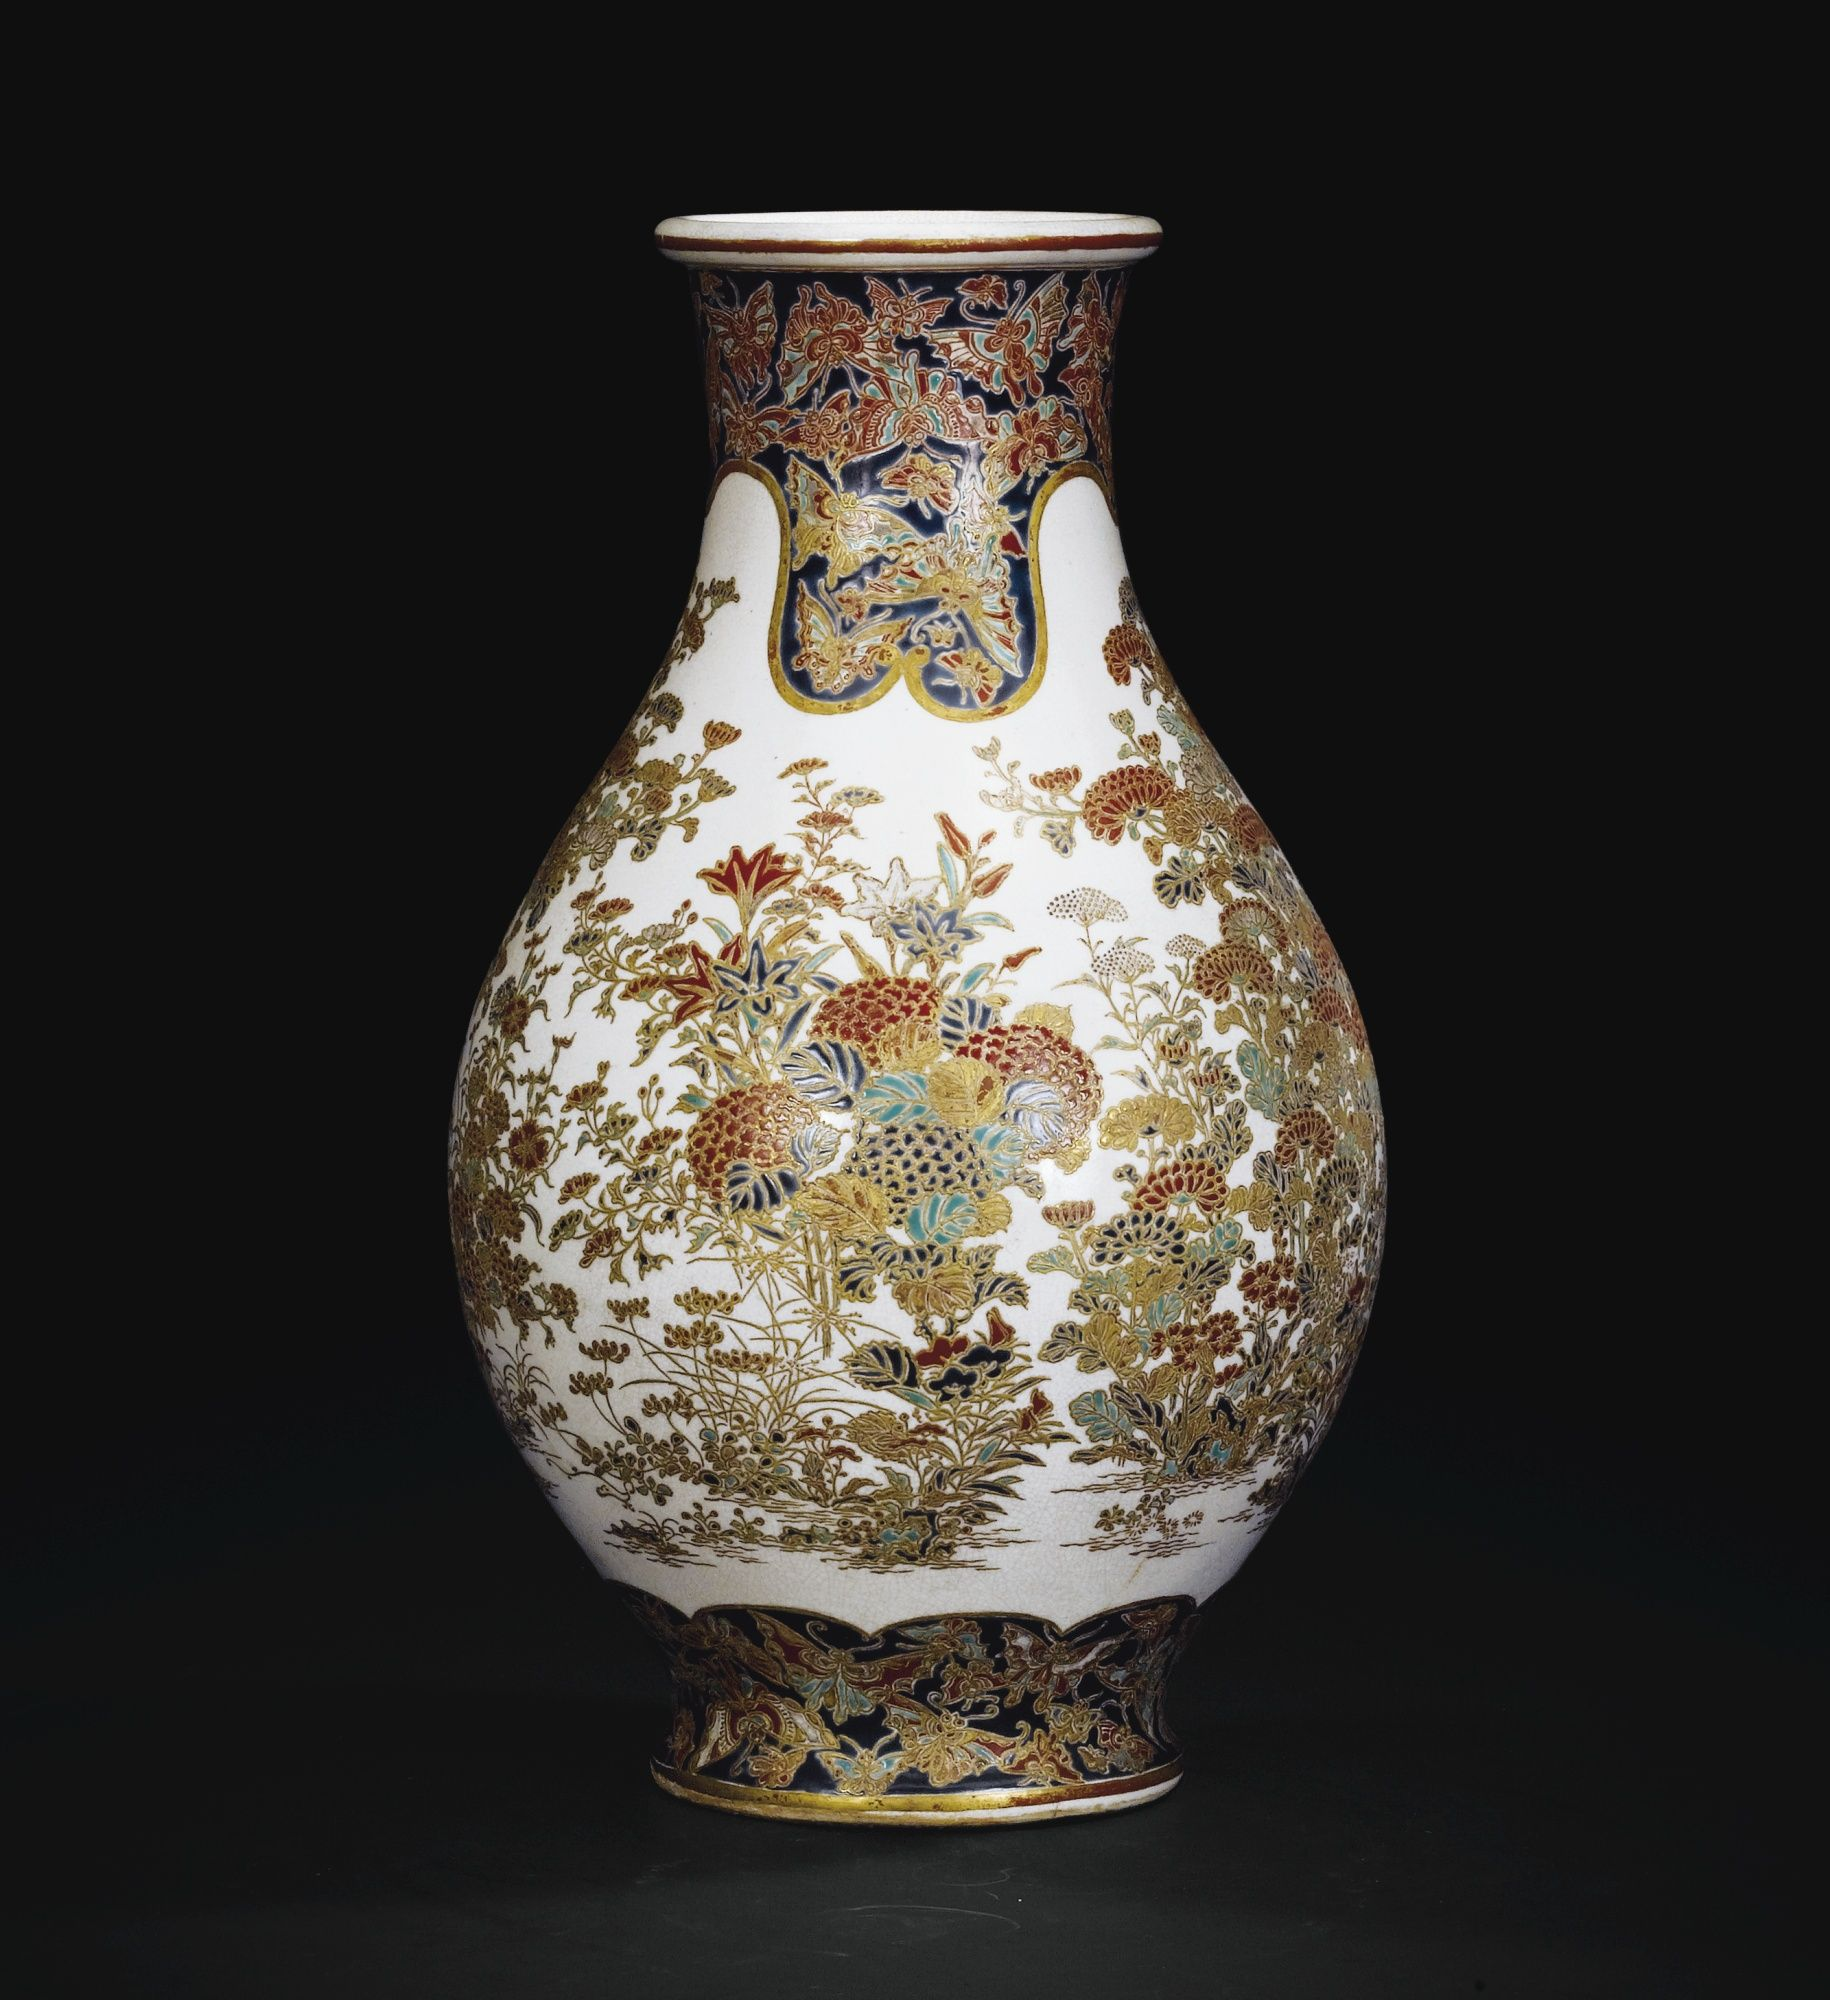 A satsuma vase japan edo period signed tawara gyokkozan a satsuma vase japan edo period signed tawara gyokkozan kunimitsu and dated march 1819 reviewsmspy